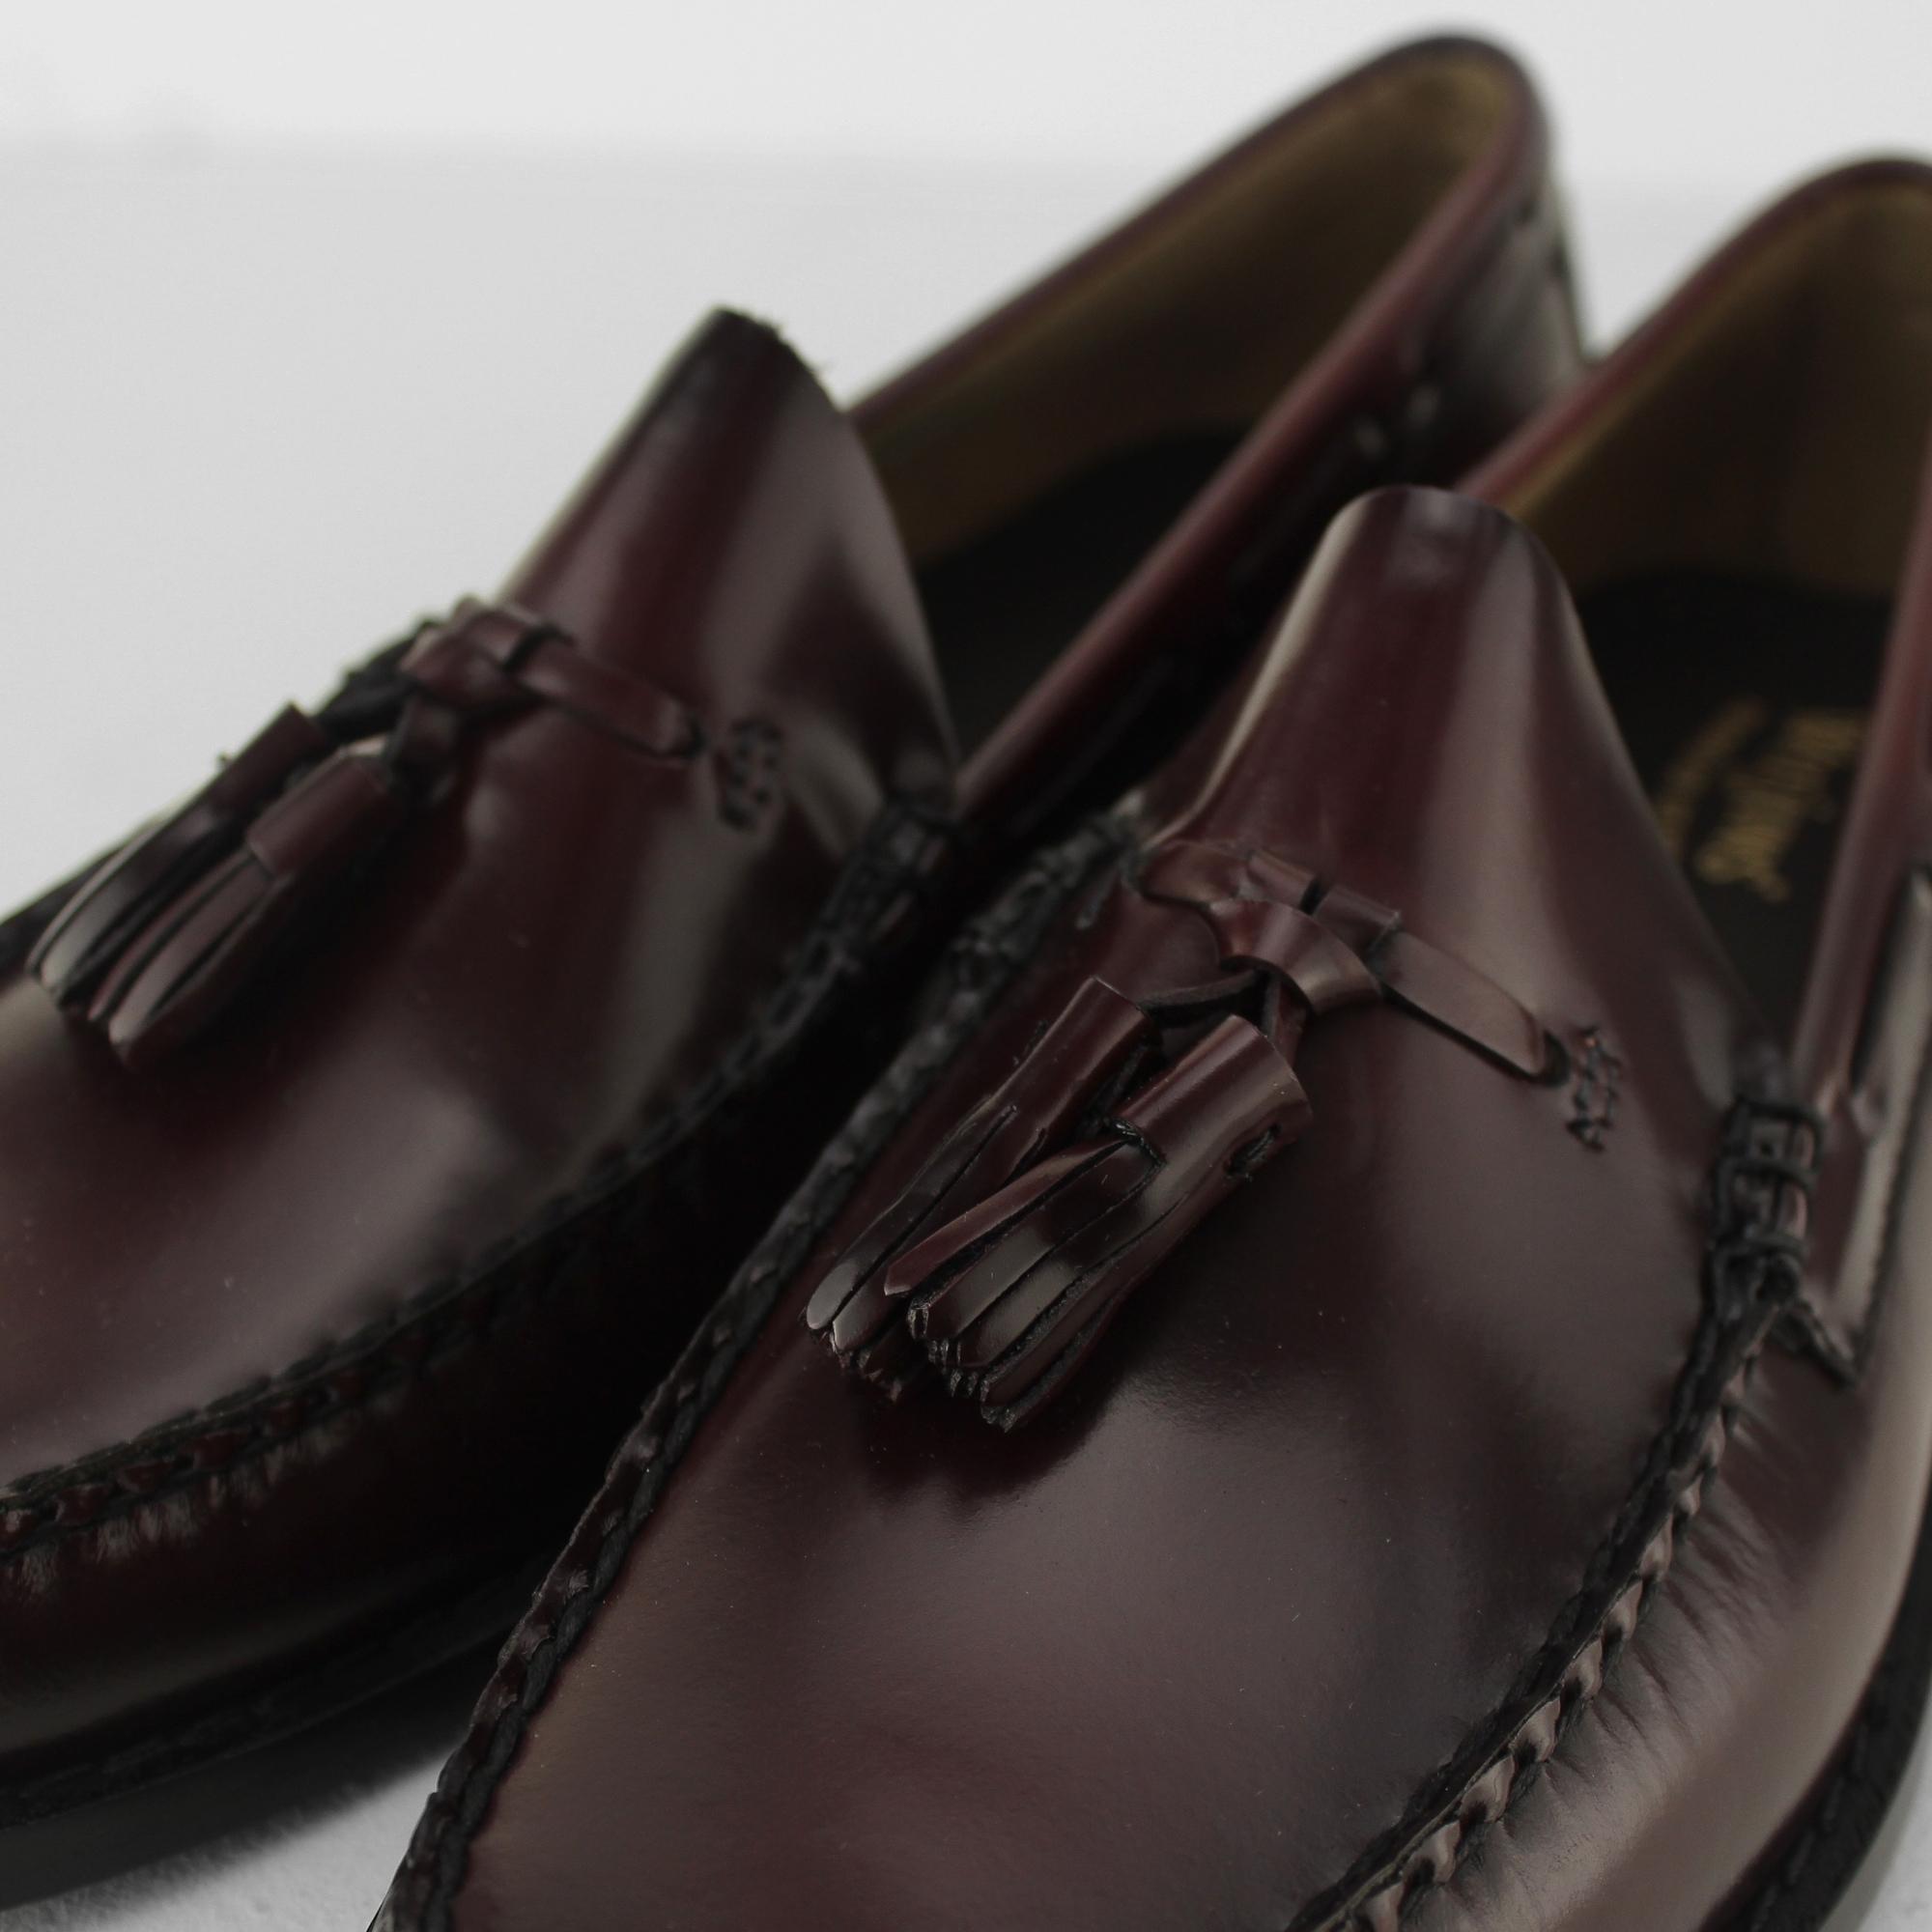 afb28ade3c G.H. Bass   Co. Weejuns LARKIN Mens Polished Leather Moccasin Tassel ...